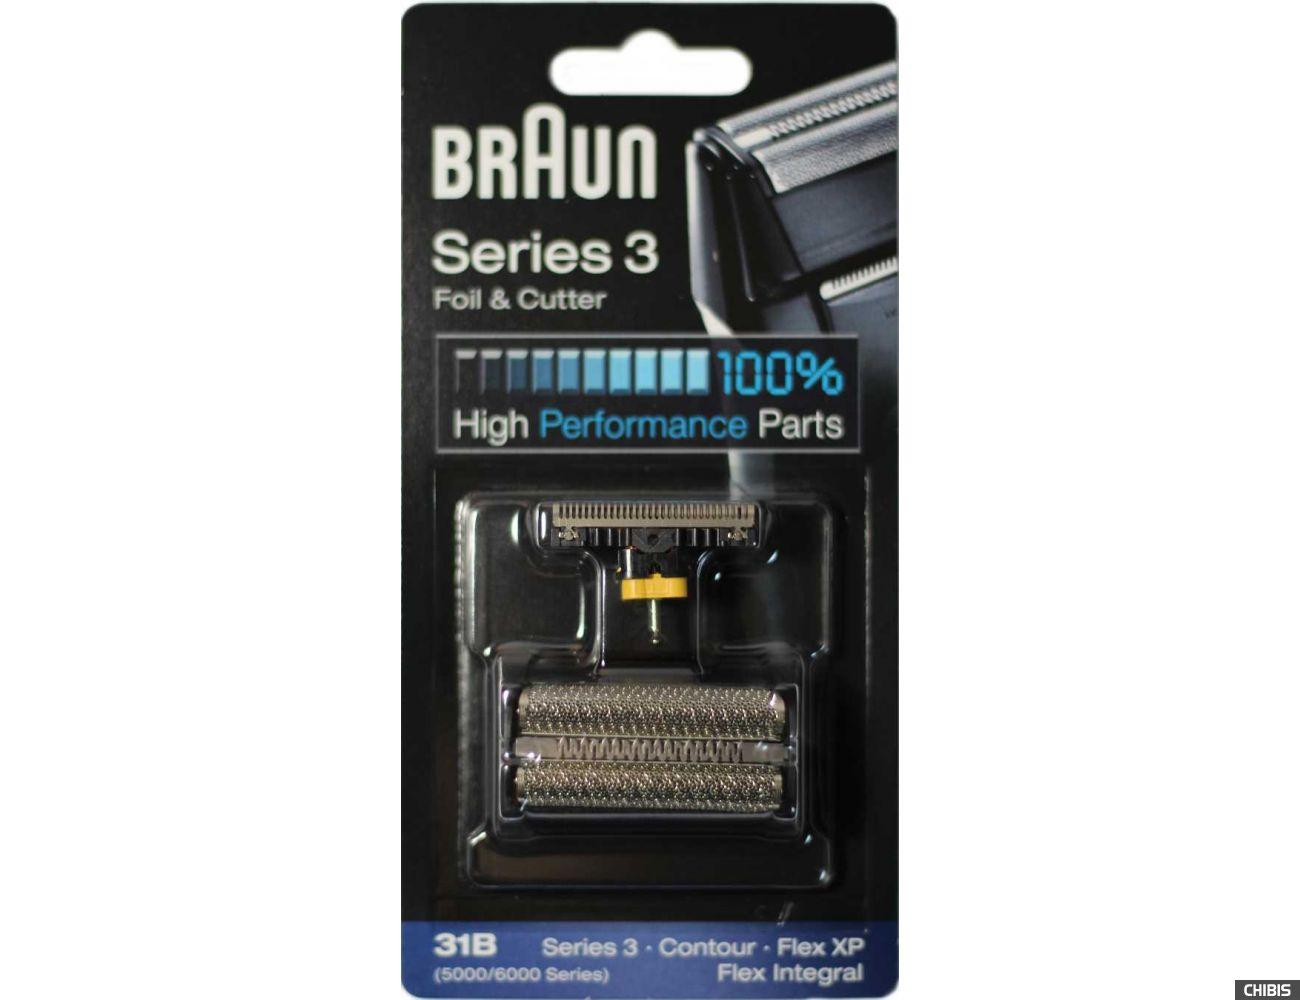 Сетка Braun 31B набор сетка + нож оригинал Германия